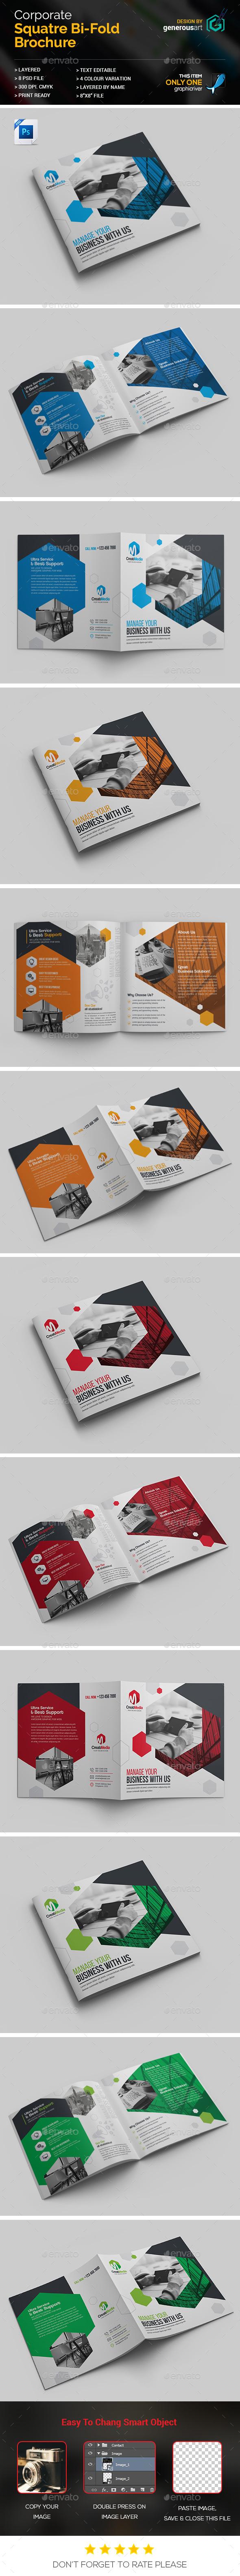 Business Square Bi-Fold Template - Corporate Brochures